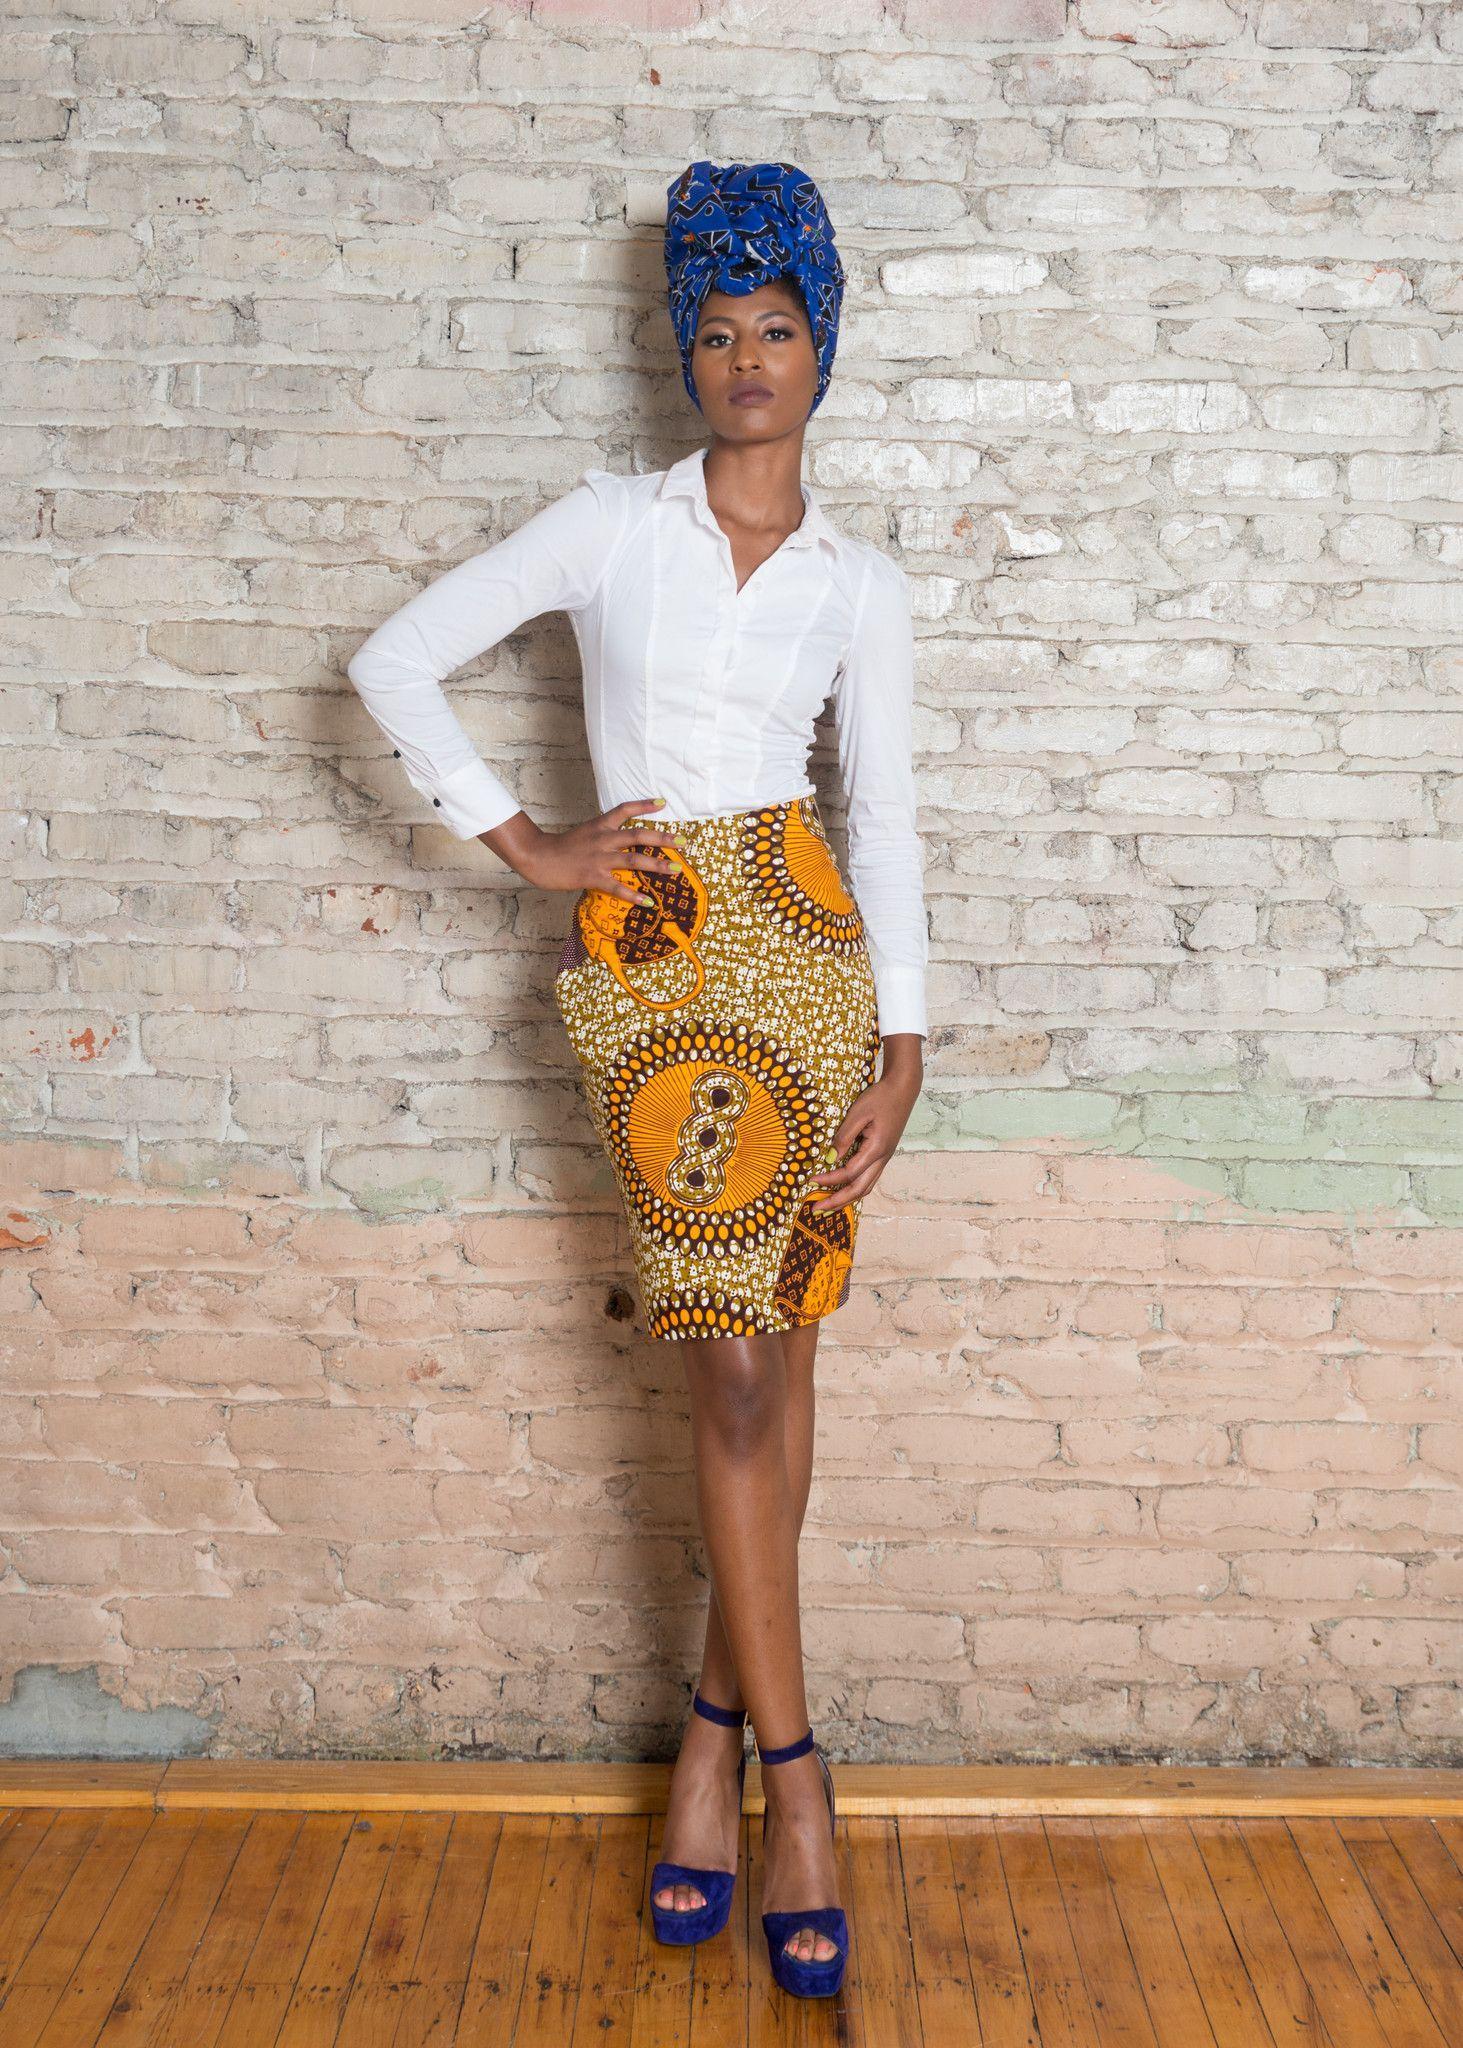 b10efb38127d6b Ankara (African Print) Pencil Skirt Make a statement at work, church or  just keeping it casual at any event in this great Ankara pencil skirt.